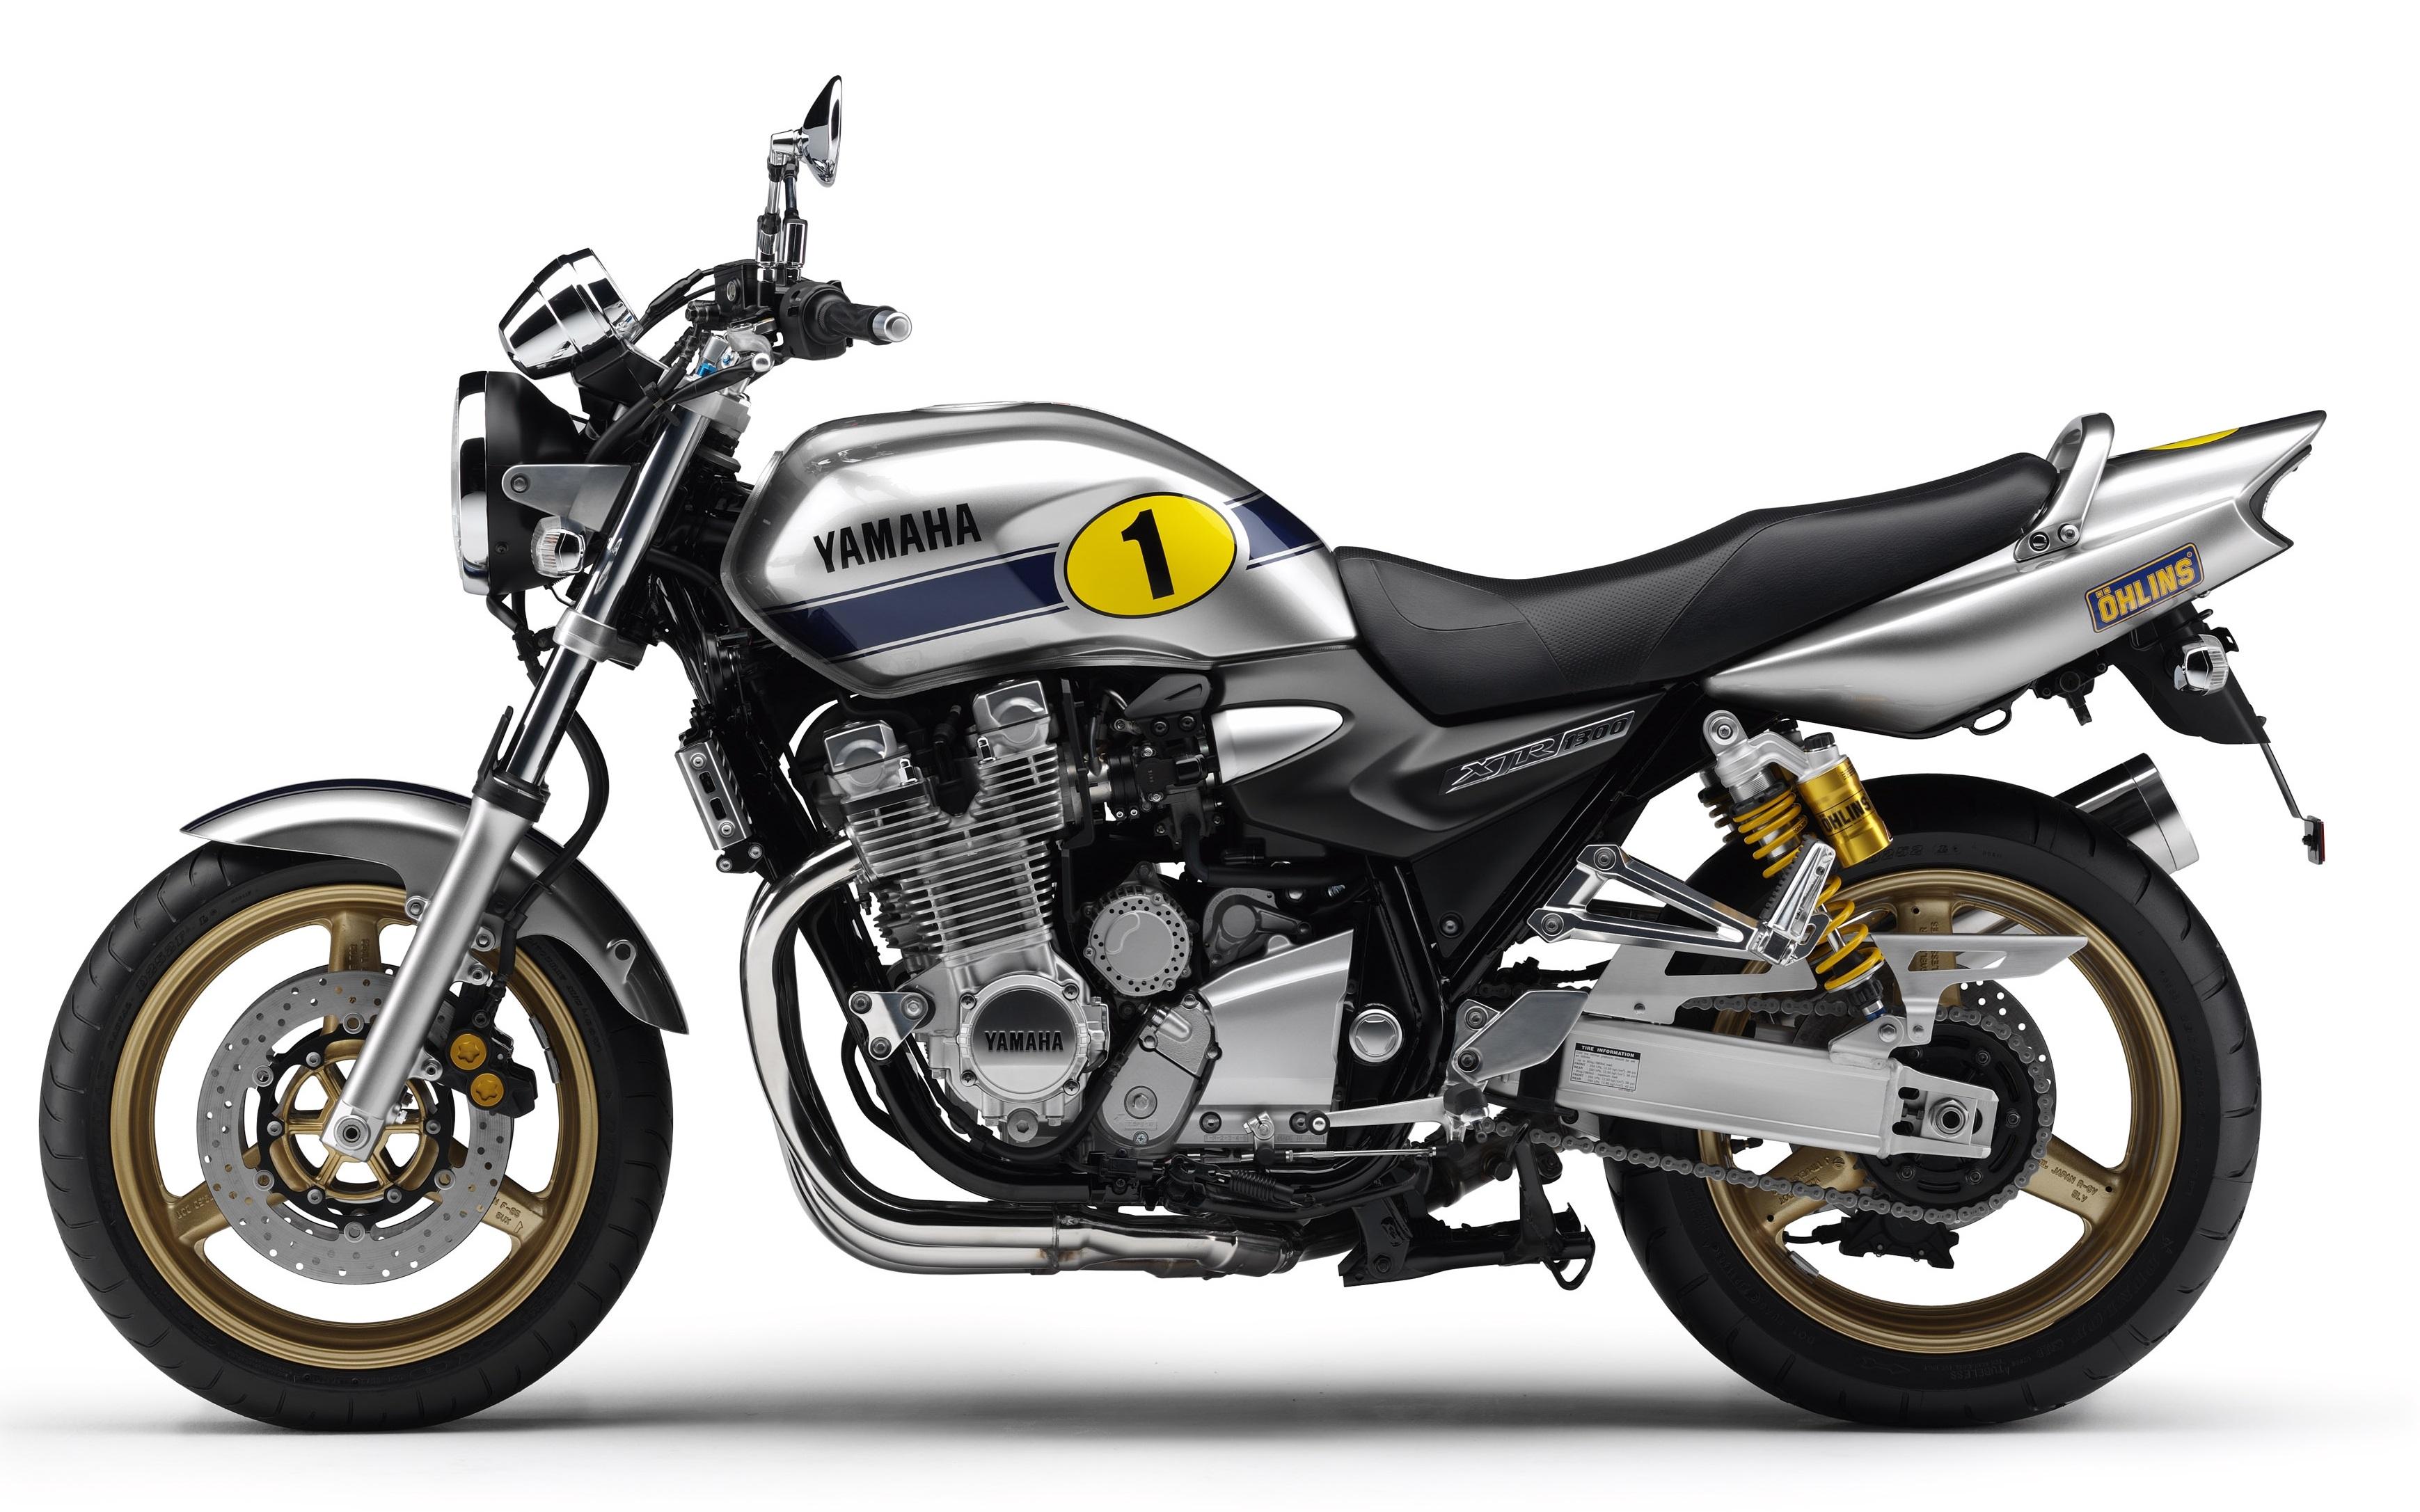 For Sale Yamaha XJR1300 O The Bike Market